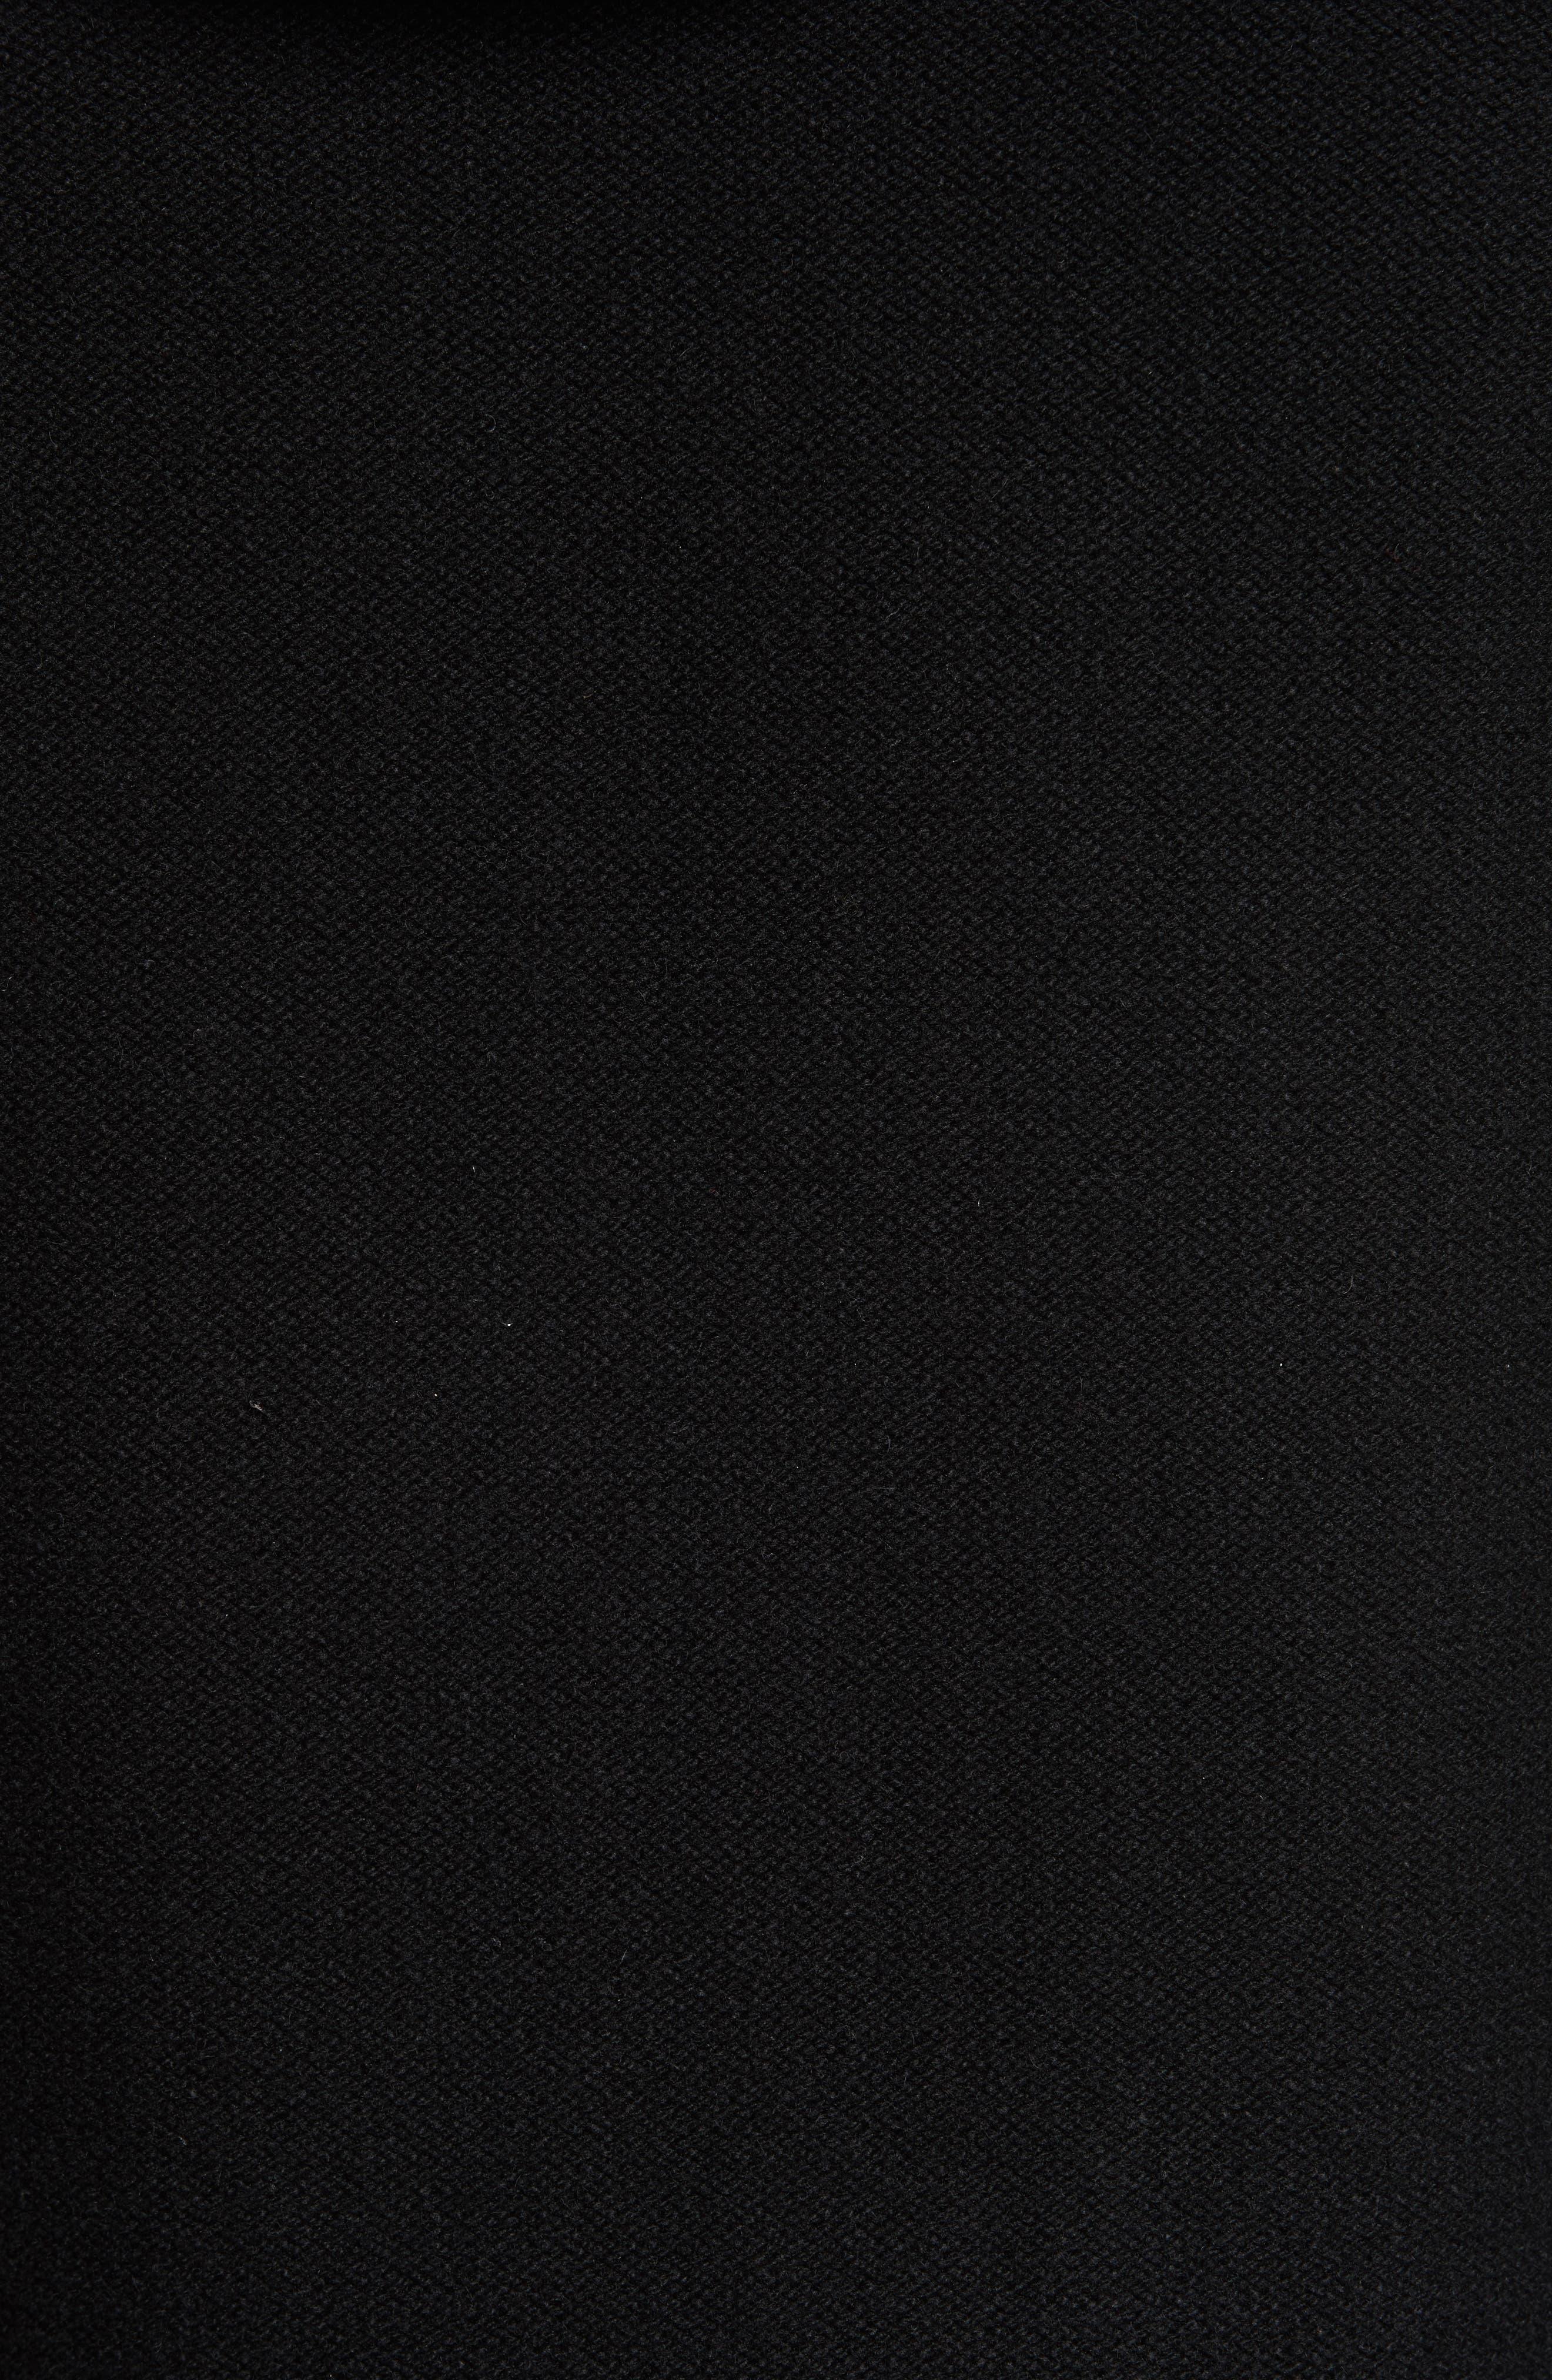 Knit Zip Hoodie with Faux Fur Trim,                             Alternate thumbnail 5, color,                             Bla01